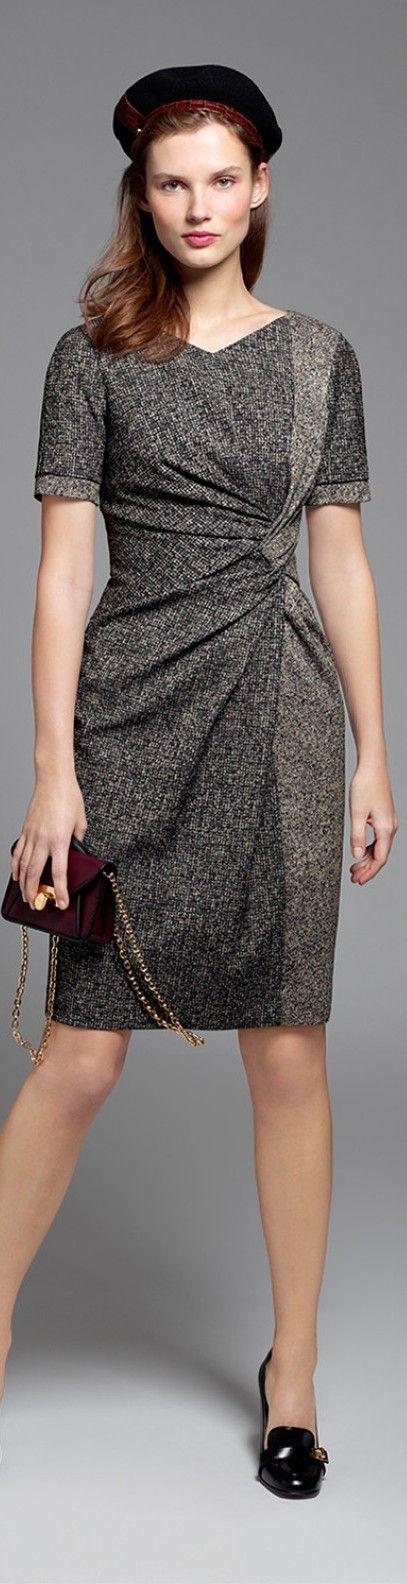 Paule Ka 2015/16 gray dress. Fall autumn women fashion outfit clothing stylish apparel @roressclothes closet ideas